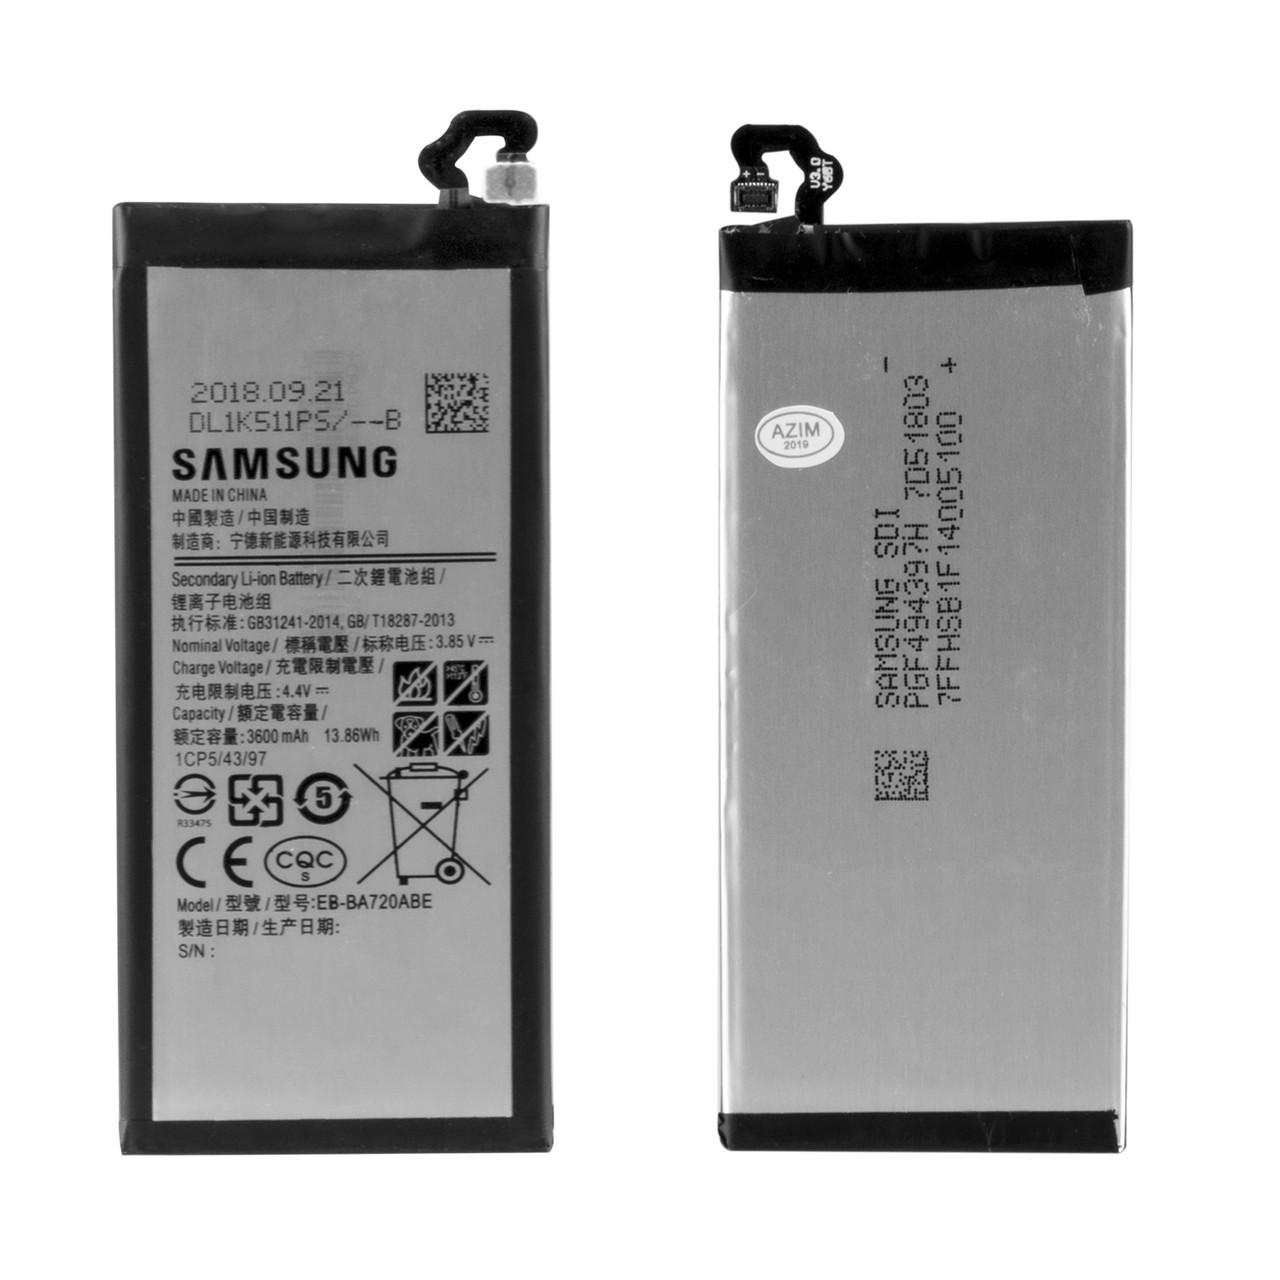 Аккумулятор Samsung Galaxy A7 (2017) A720 EB-BA720ABE 3600mAh Original Double IC plastic box